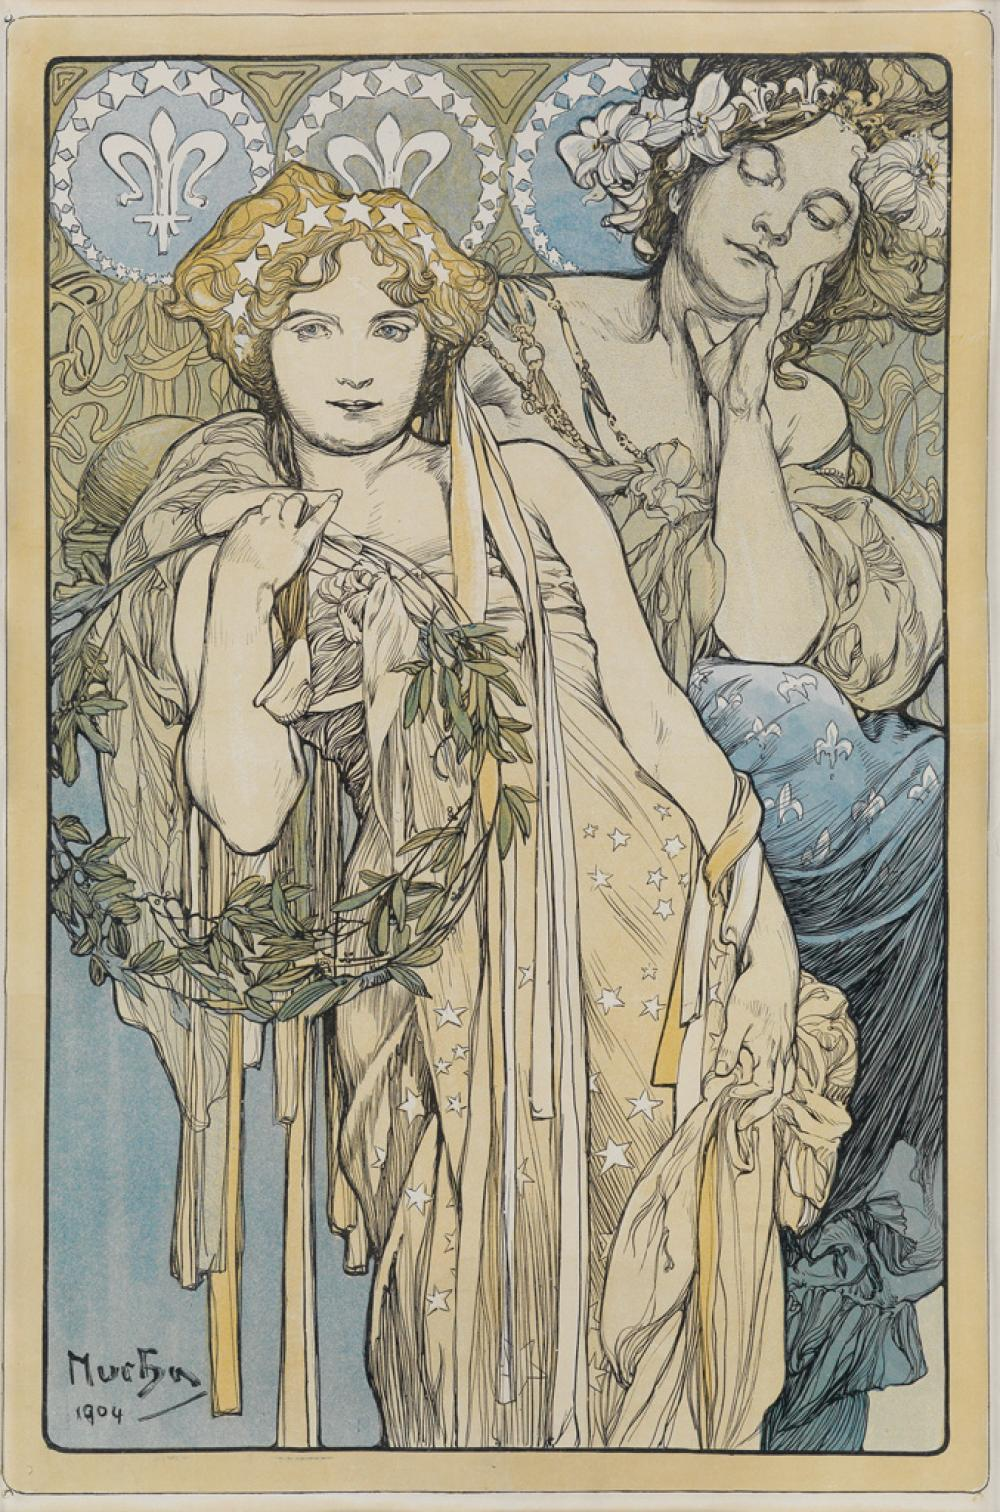 ALPHONSE MUCHA (1860-1939). [FRIENDSHIP.] 1904. 18x12 inches, 46x30 cm.